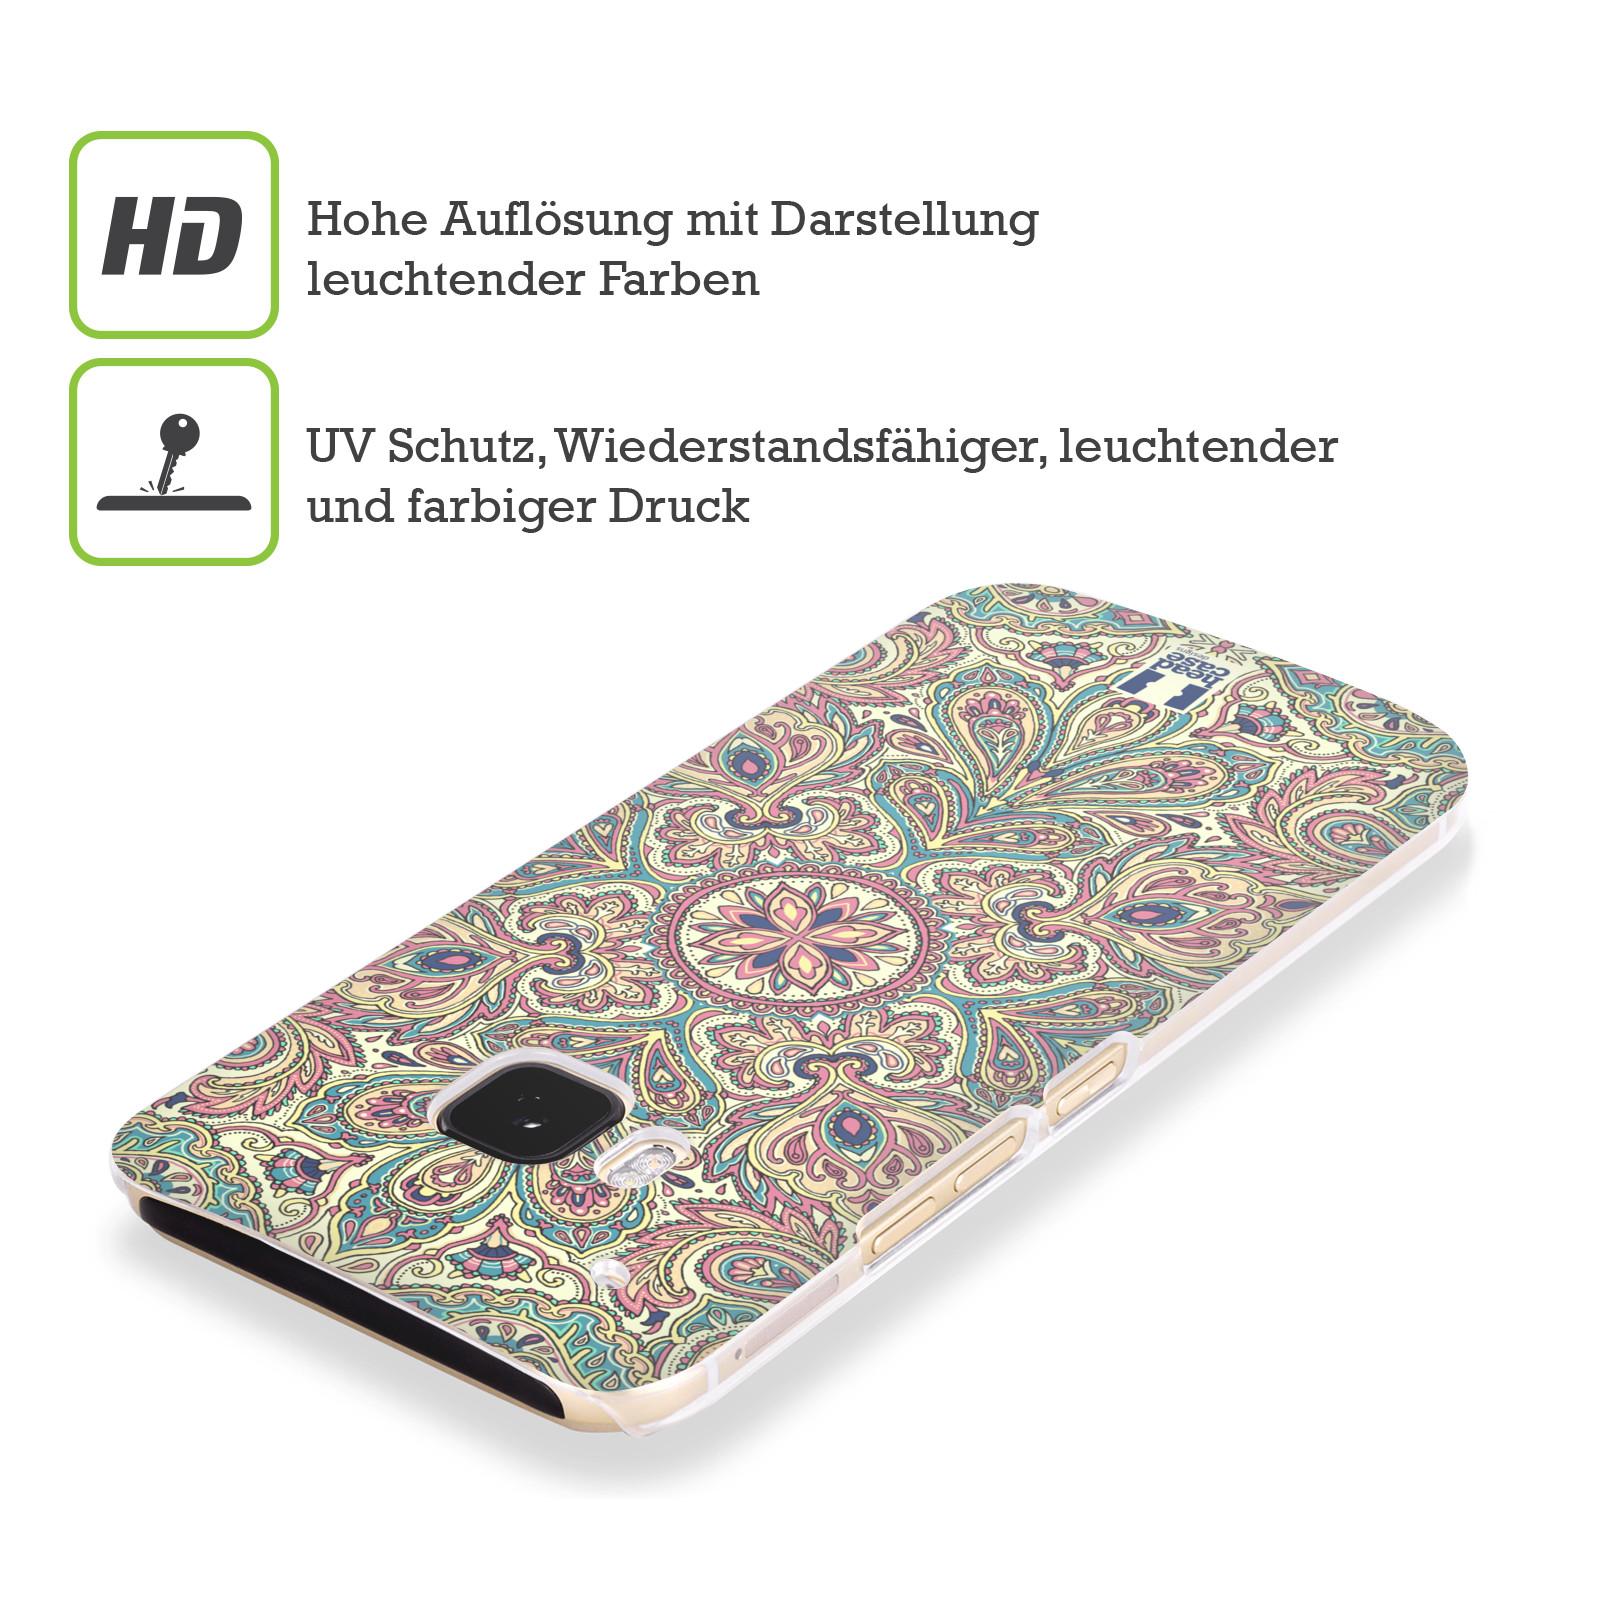 HEAD-CASE-DESIGNS-KOMPLEX-PAISLEY-RUCKSEITE-HULLE-FUR-HTC-HANDYS-1